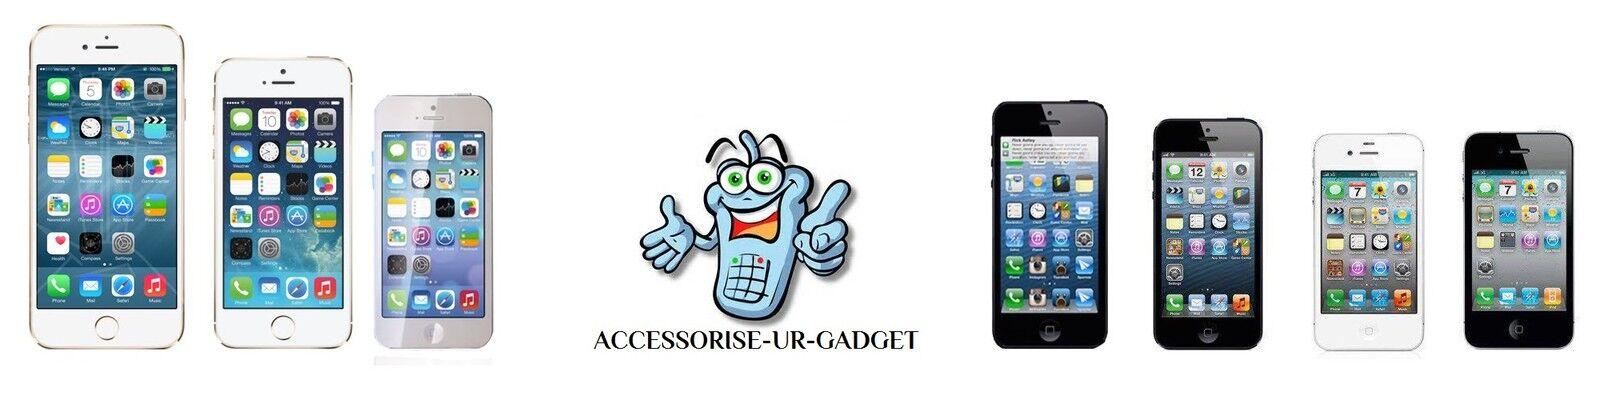 Accessorise Ur Gadget Limited